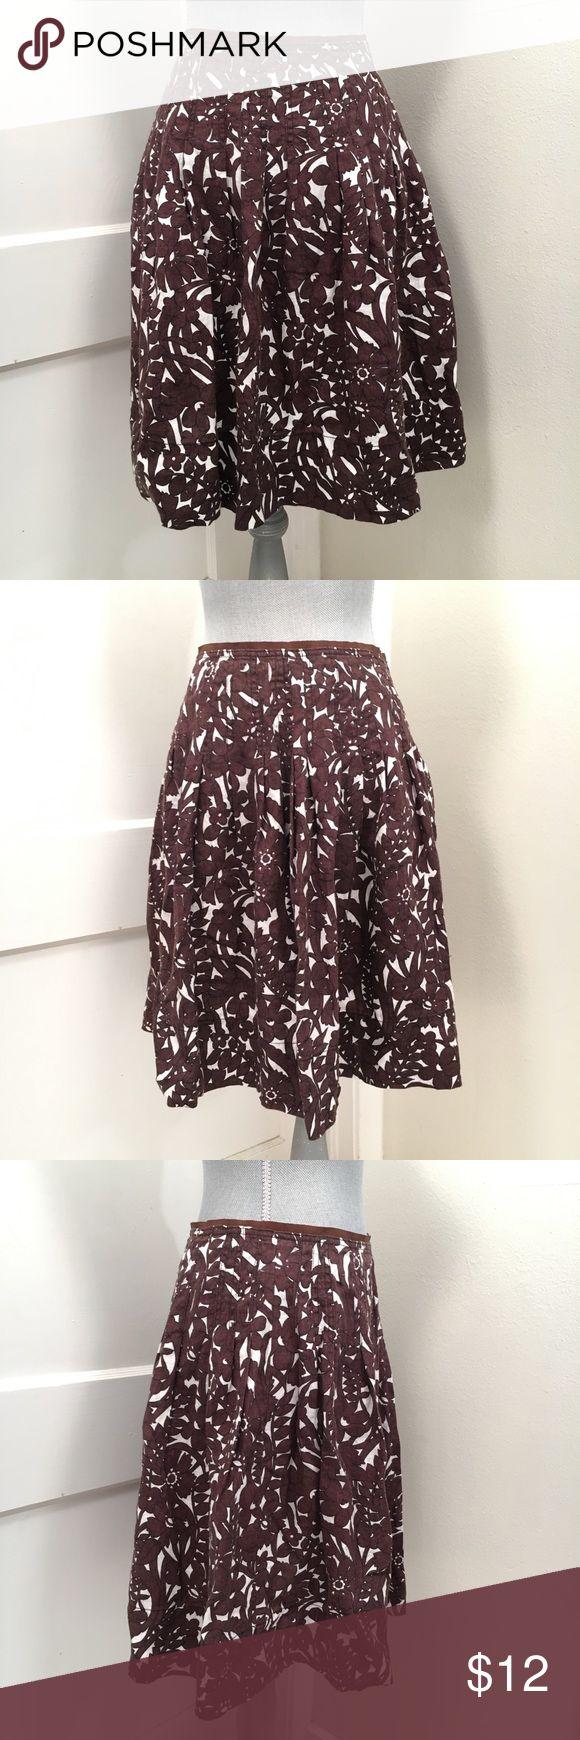 Zara floral linen pleated skirt Super cute linen skirt by Zara! zara Skirts A-Line or Full